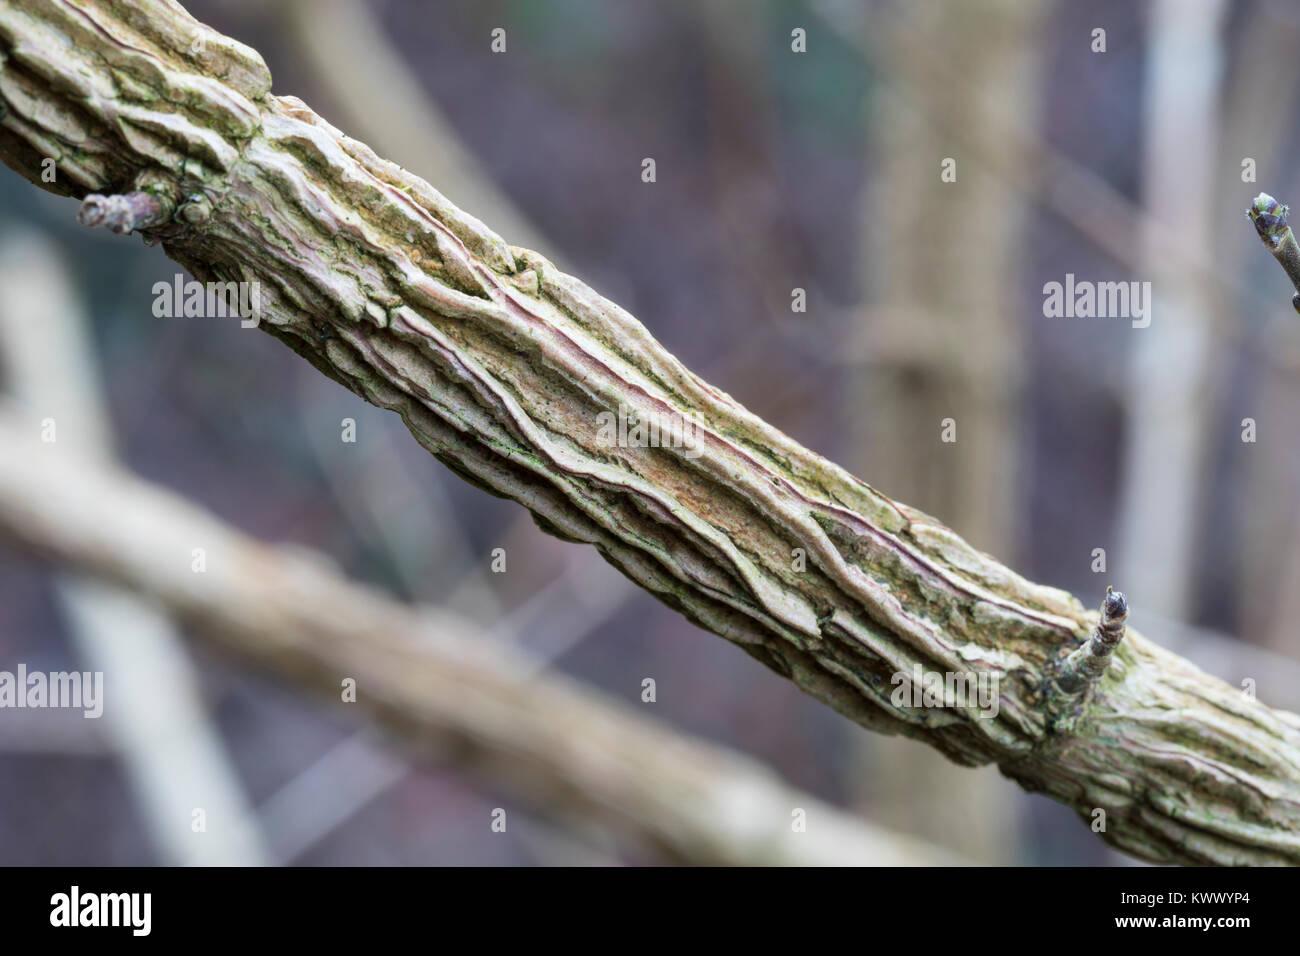 Feld-Ahorn, Feldahorn, Ahorn, Korkleiste, Korkleisten an Zweig, Acer campestre, Field Maple, Hedge Maple, Erable - Stock Image